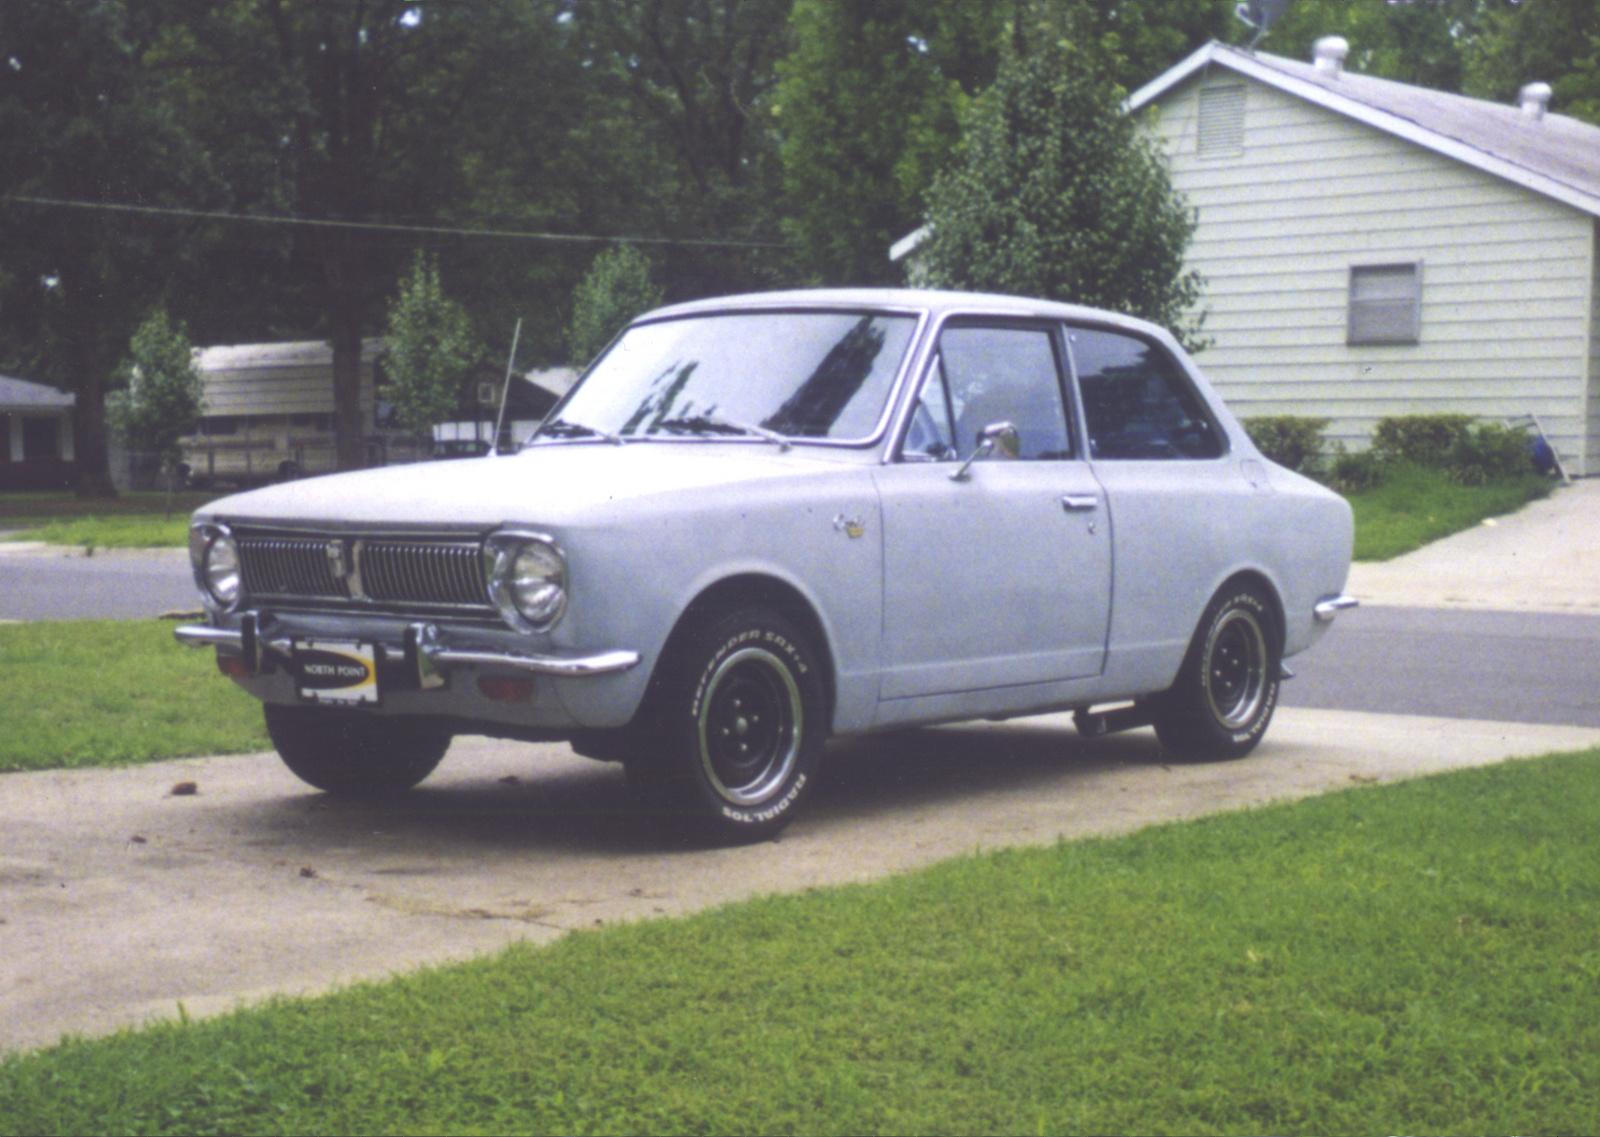 1969 Toyota Corolla Coupe, Corollanut's 1968 Toyota Corolla Coupe